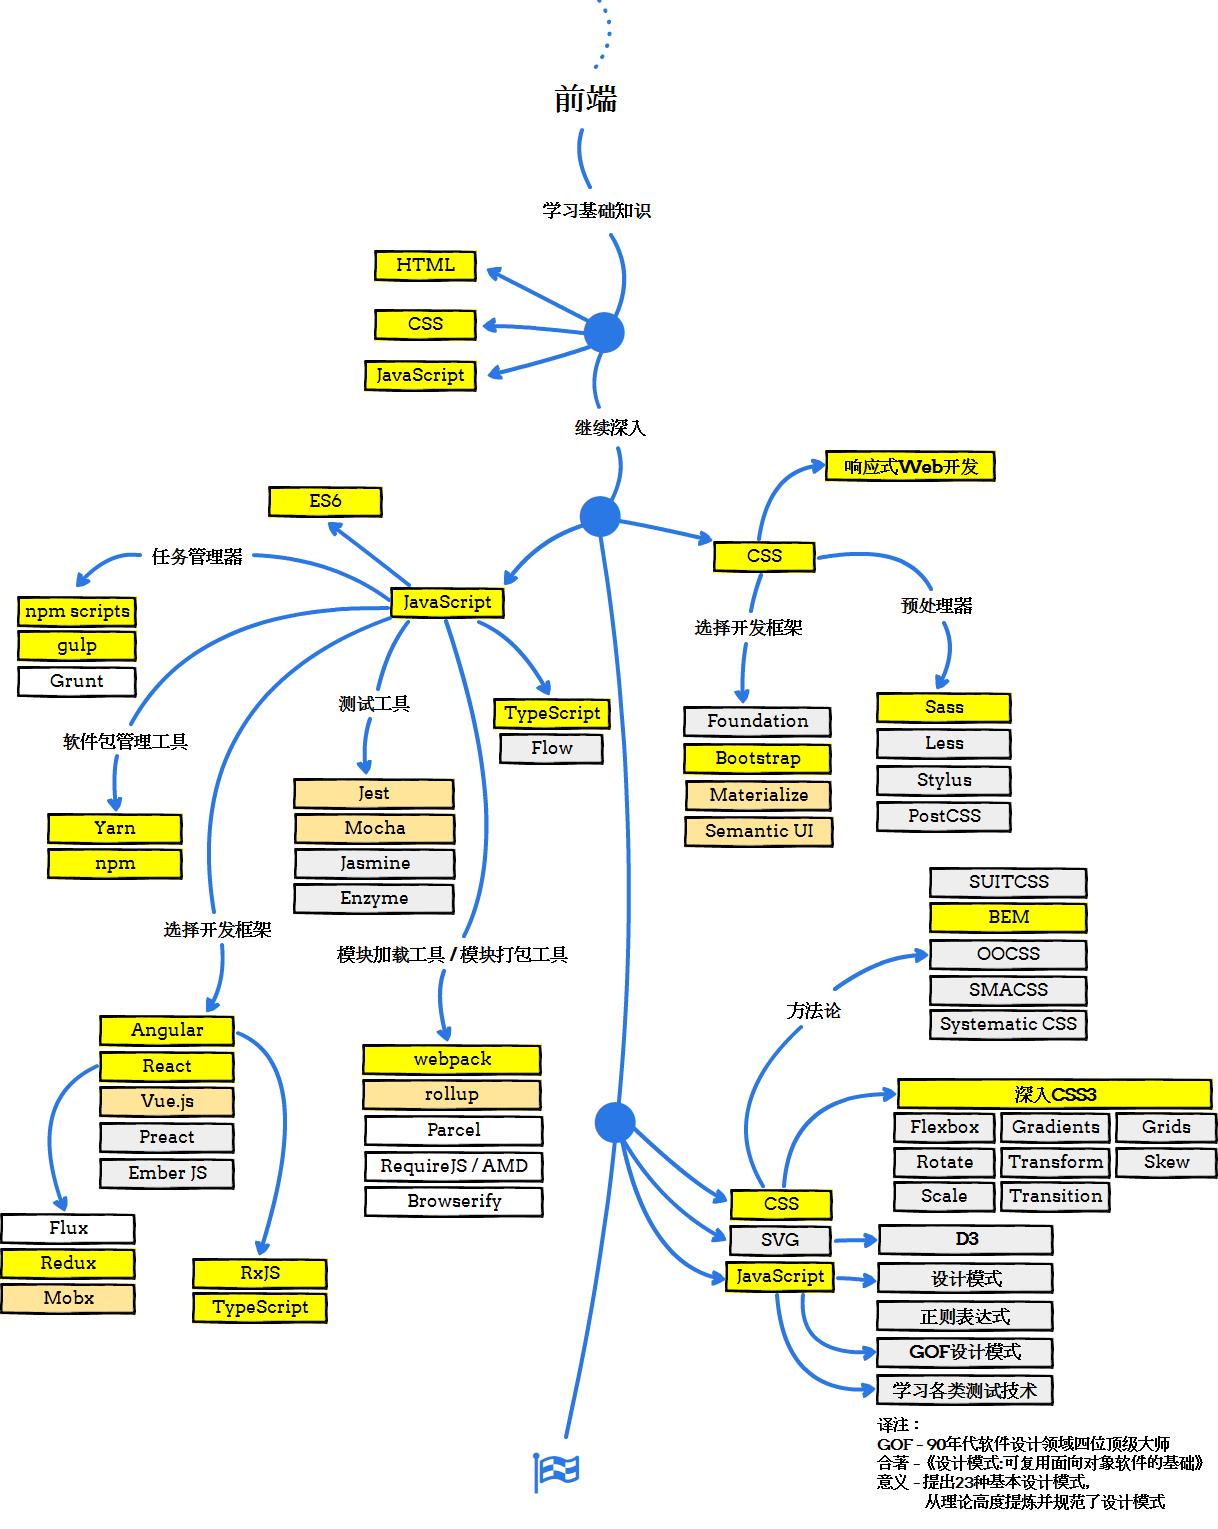 Web 开发者学习路线图 - www.runoob.com.png